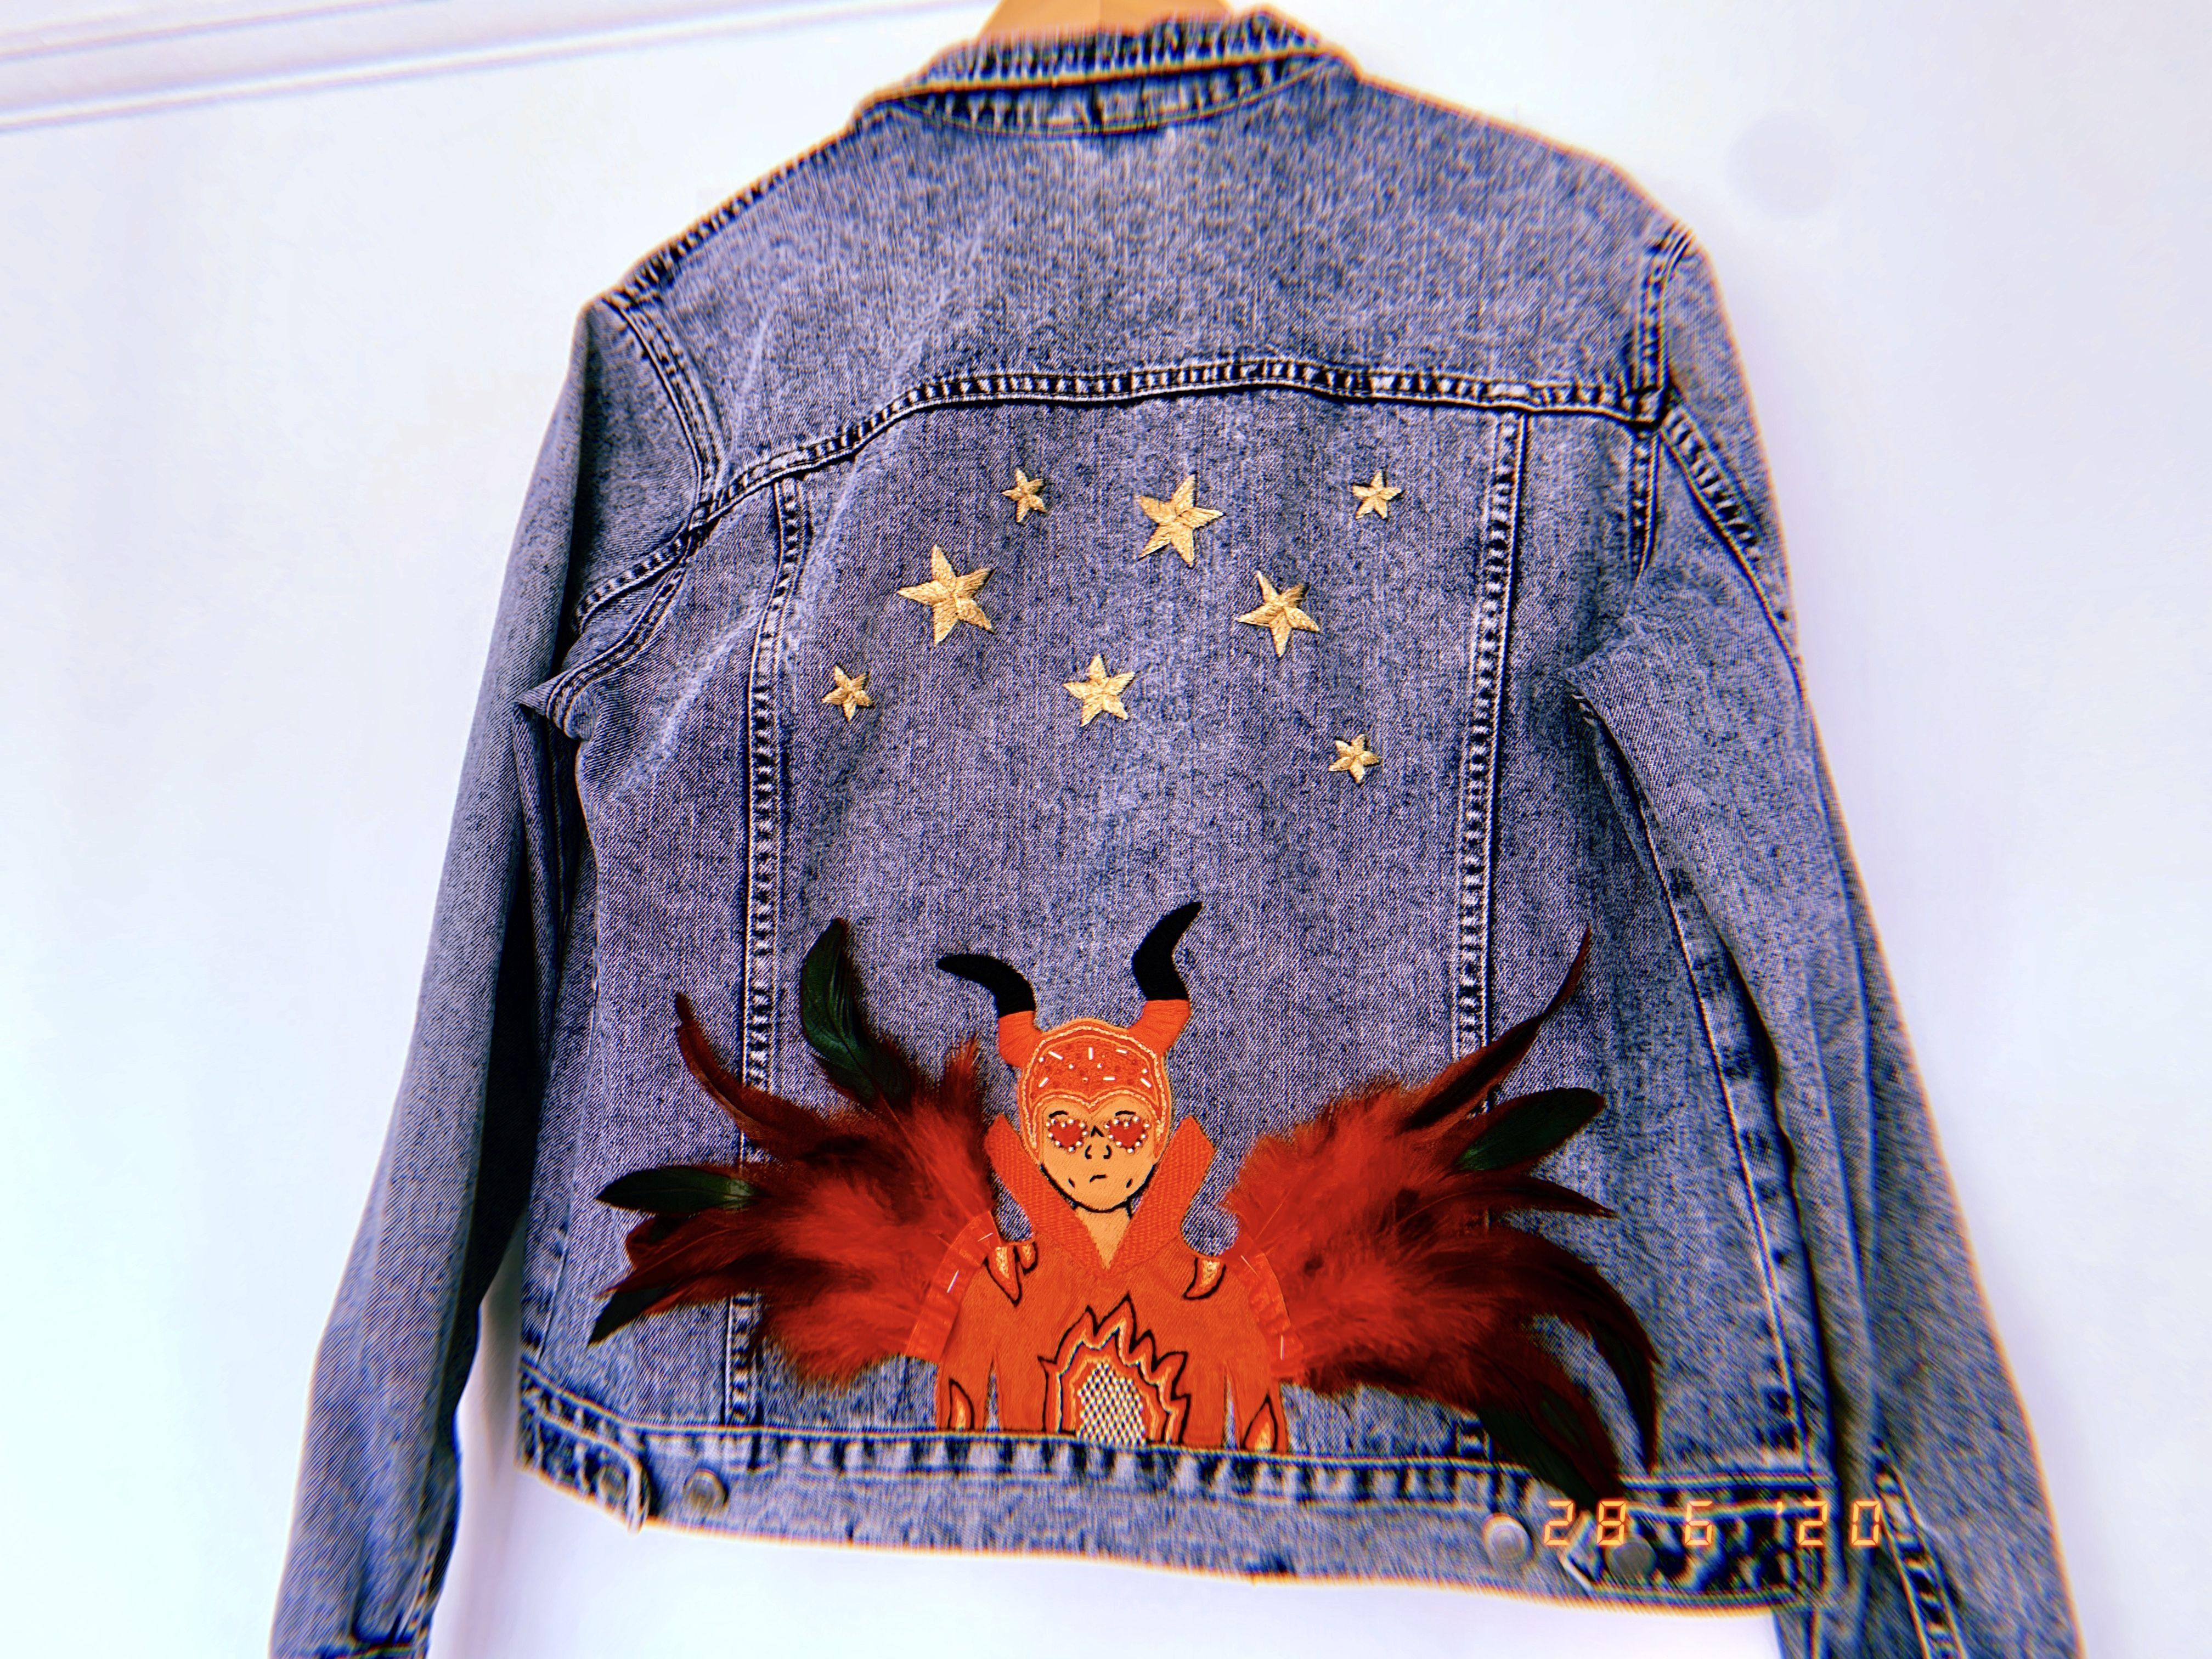 Elton John Denim Jacket In 2020 Denim Jacket Embroidered Denim Jacket Jackets [ 3024 x 4032 Pixel ]